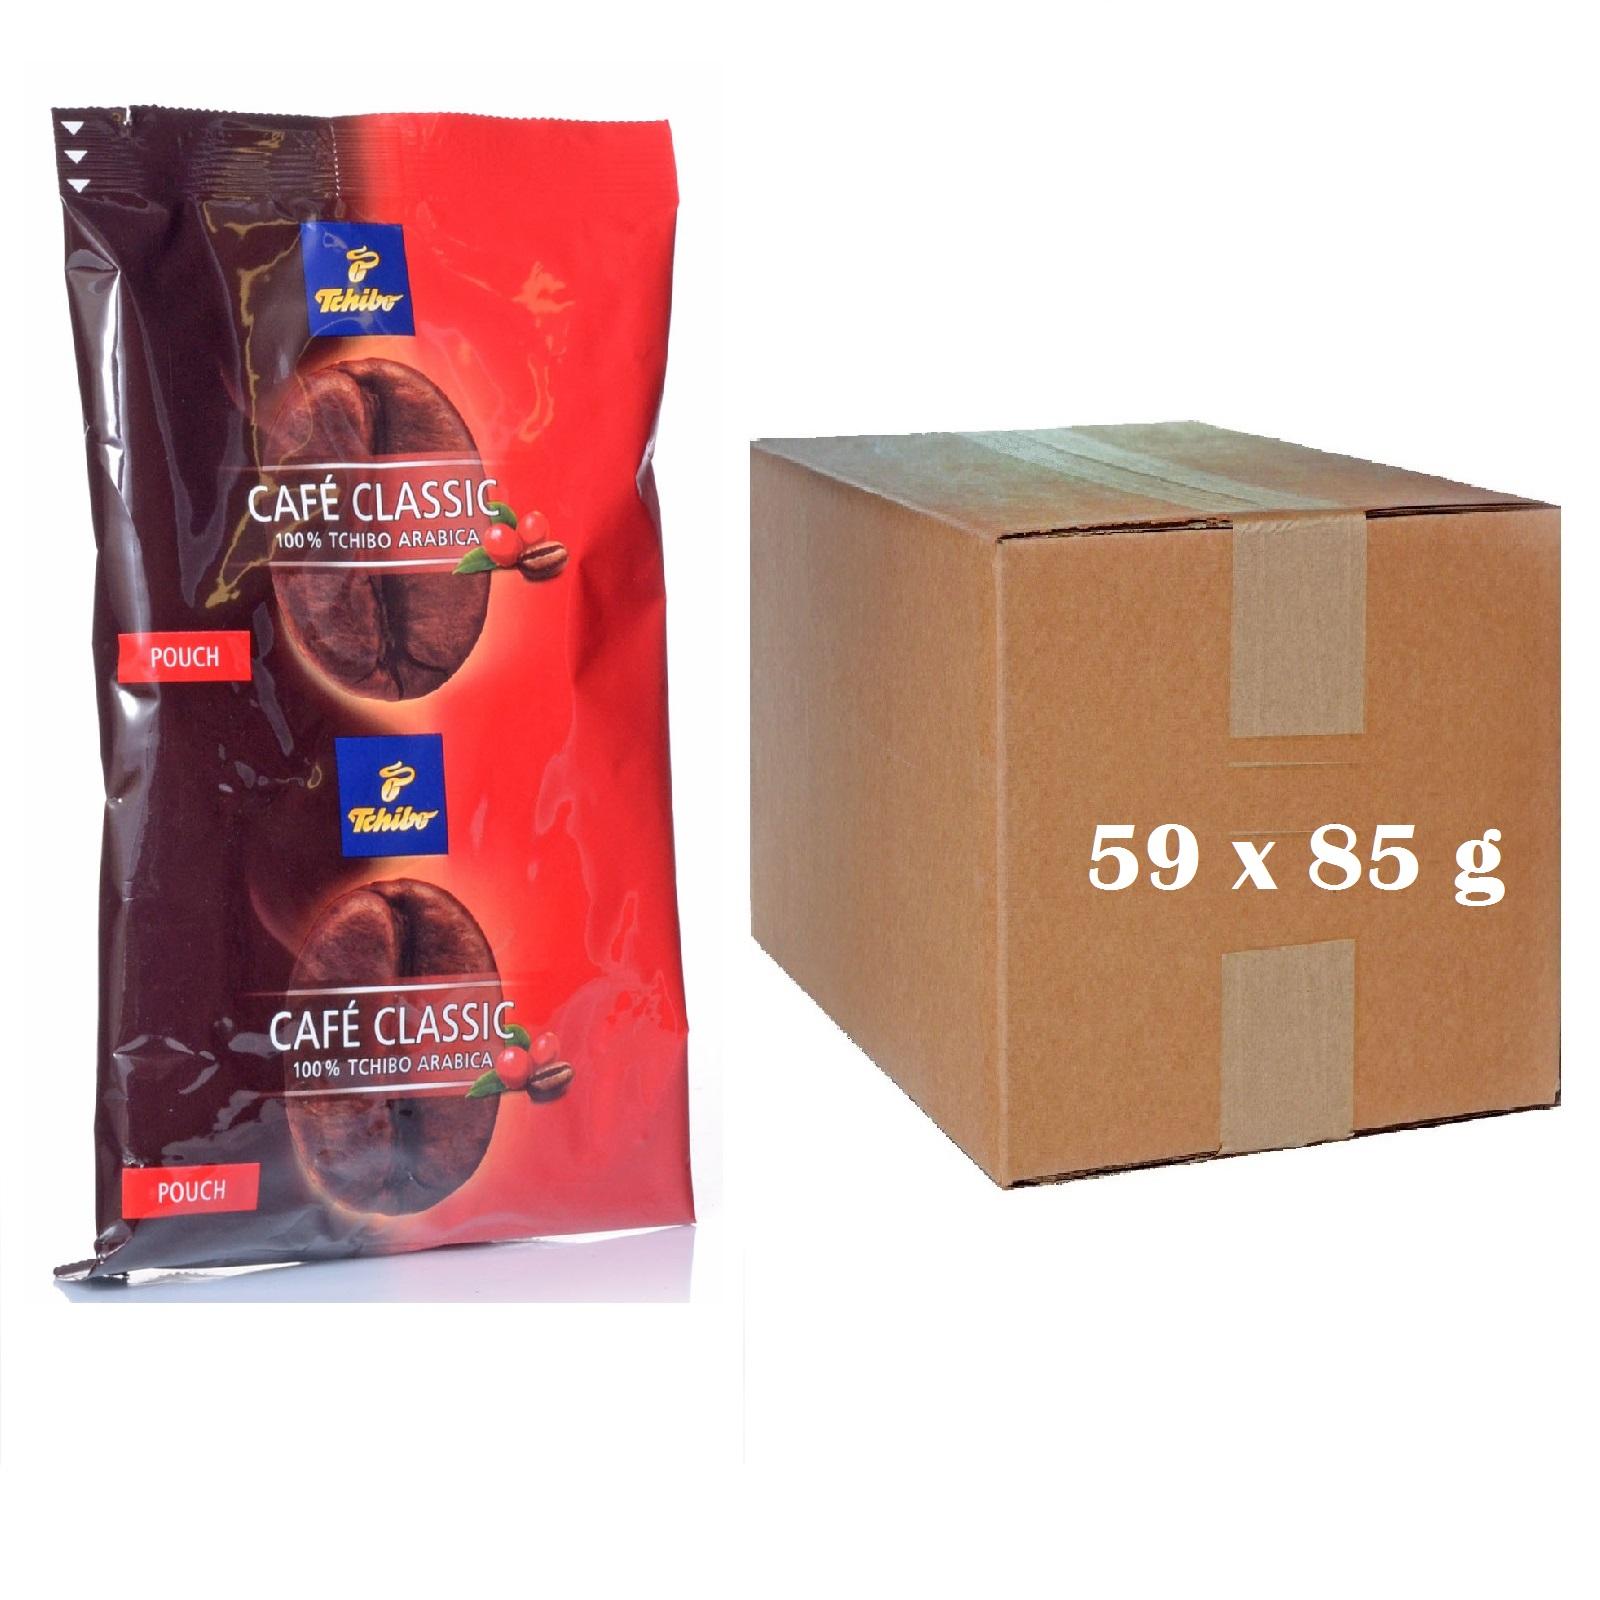 caf classic mild 59 x 85g pouch kaffee gemahlen tchibo ebay. Black Bedroom Furniture Sets. Home Design Ideas